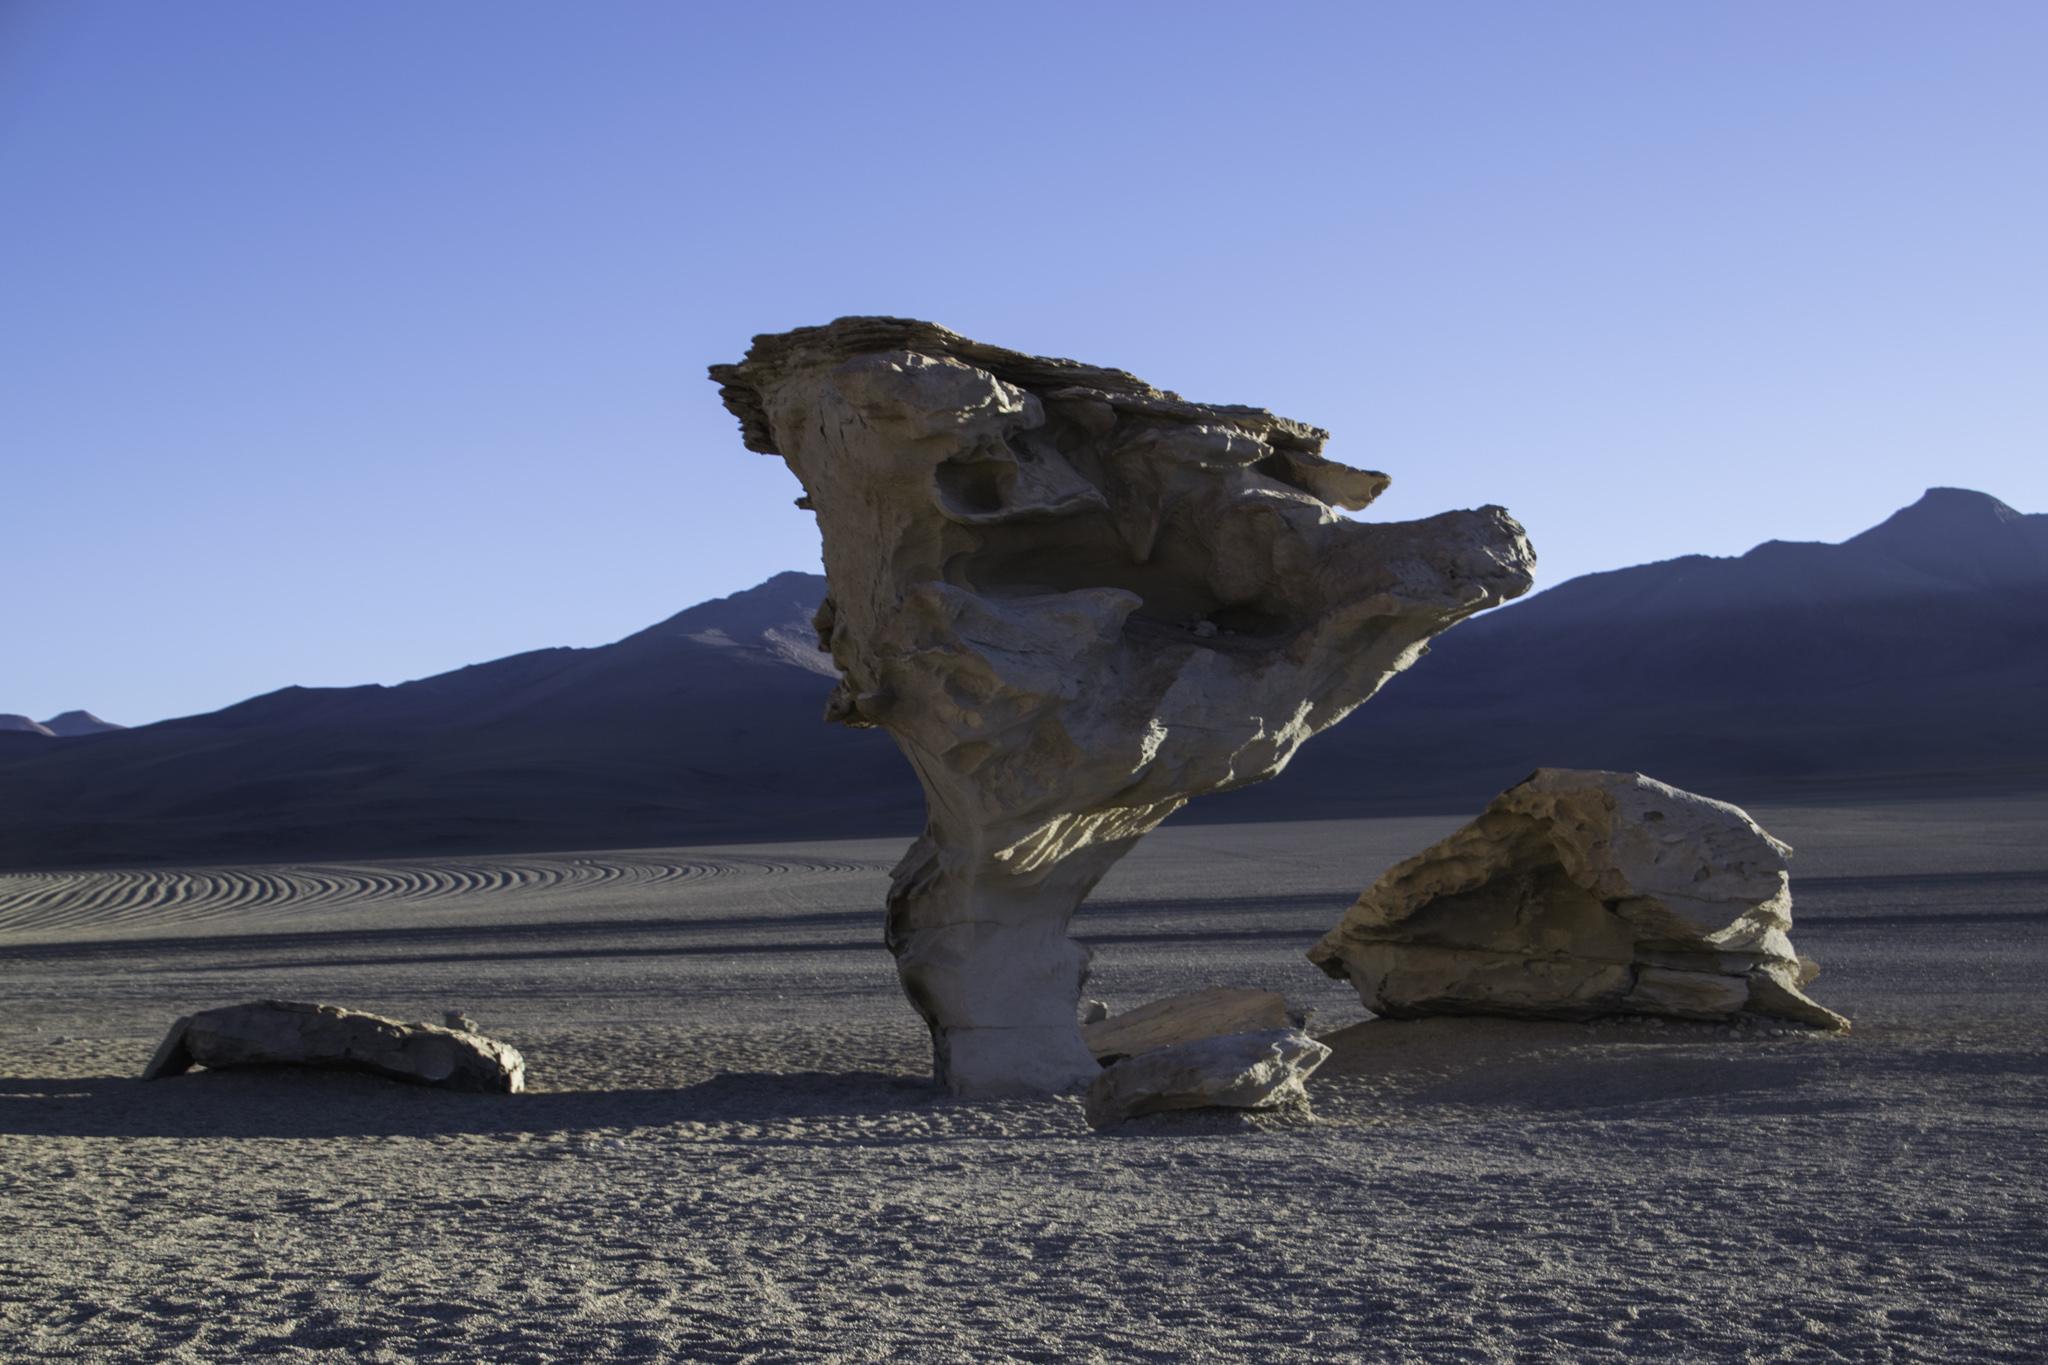 Arbol de Piedra (Baum aus Sandstein)